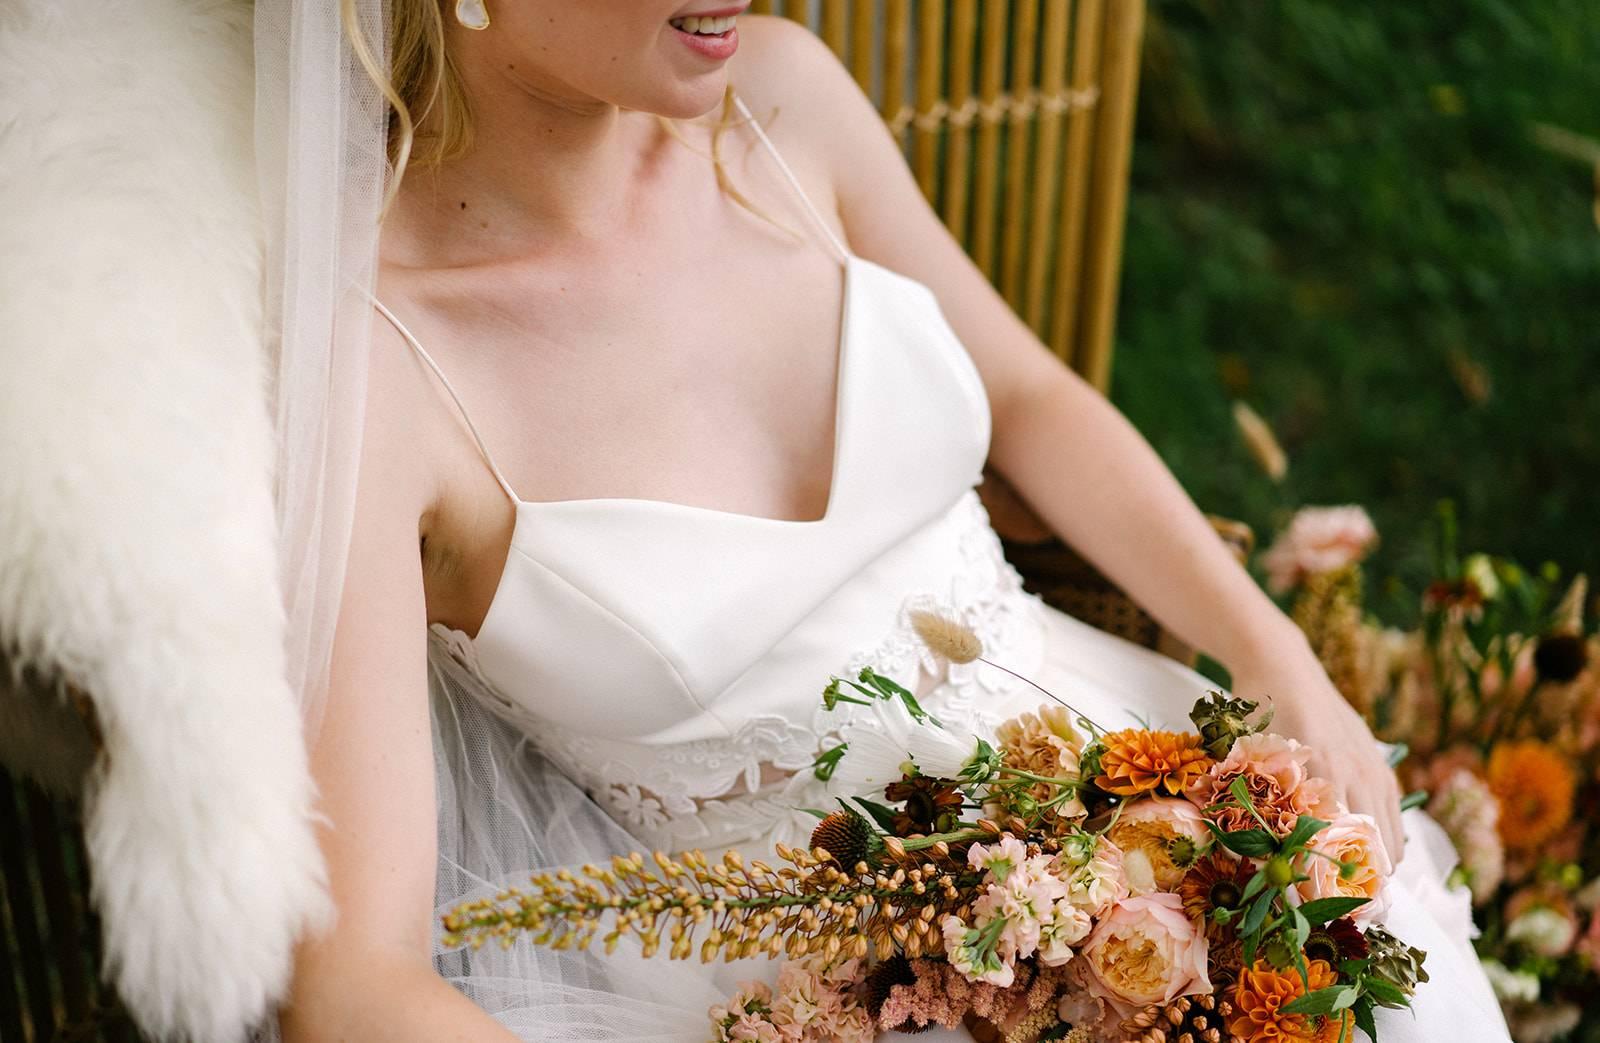 Hilde Eyckmans - HH-125b - House of Weddings